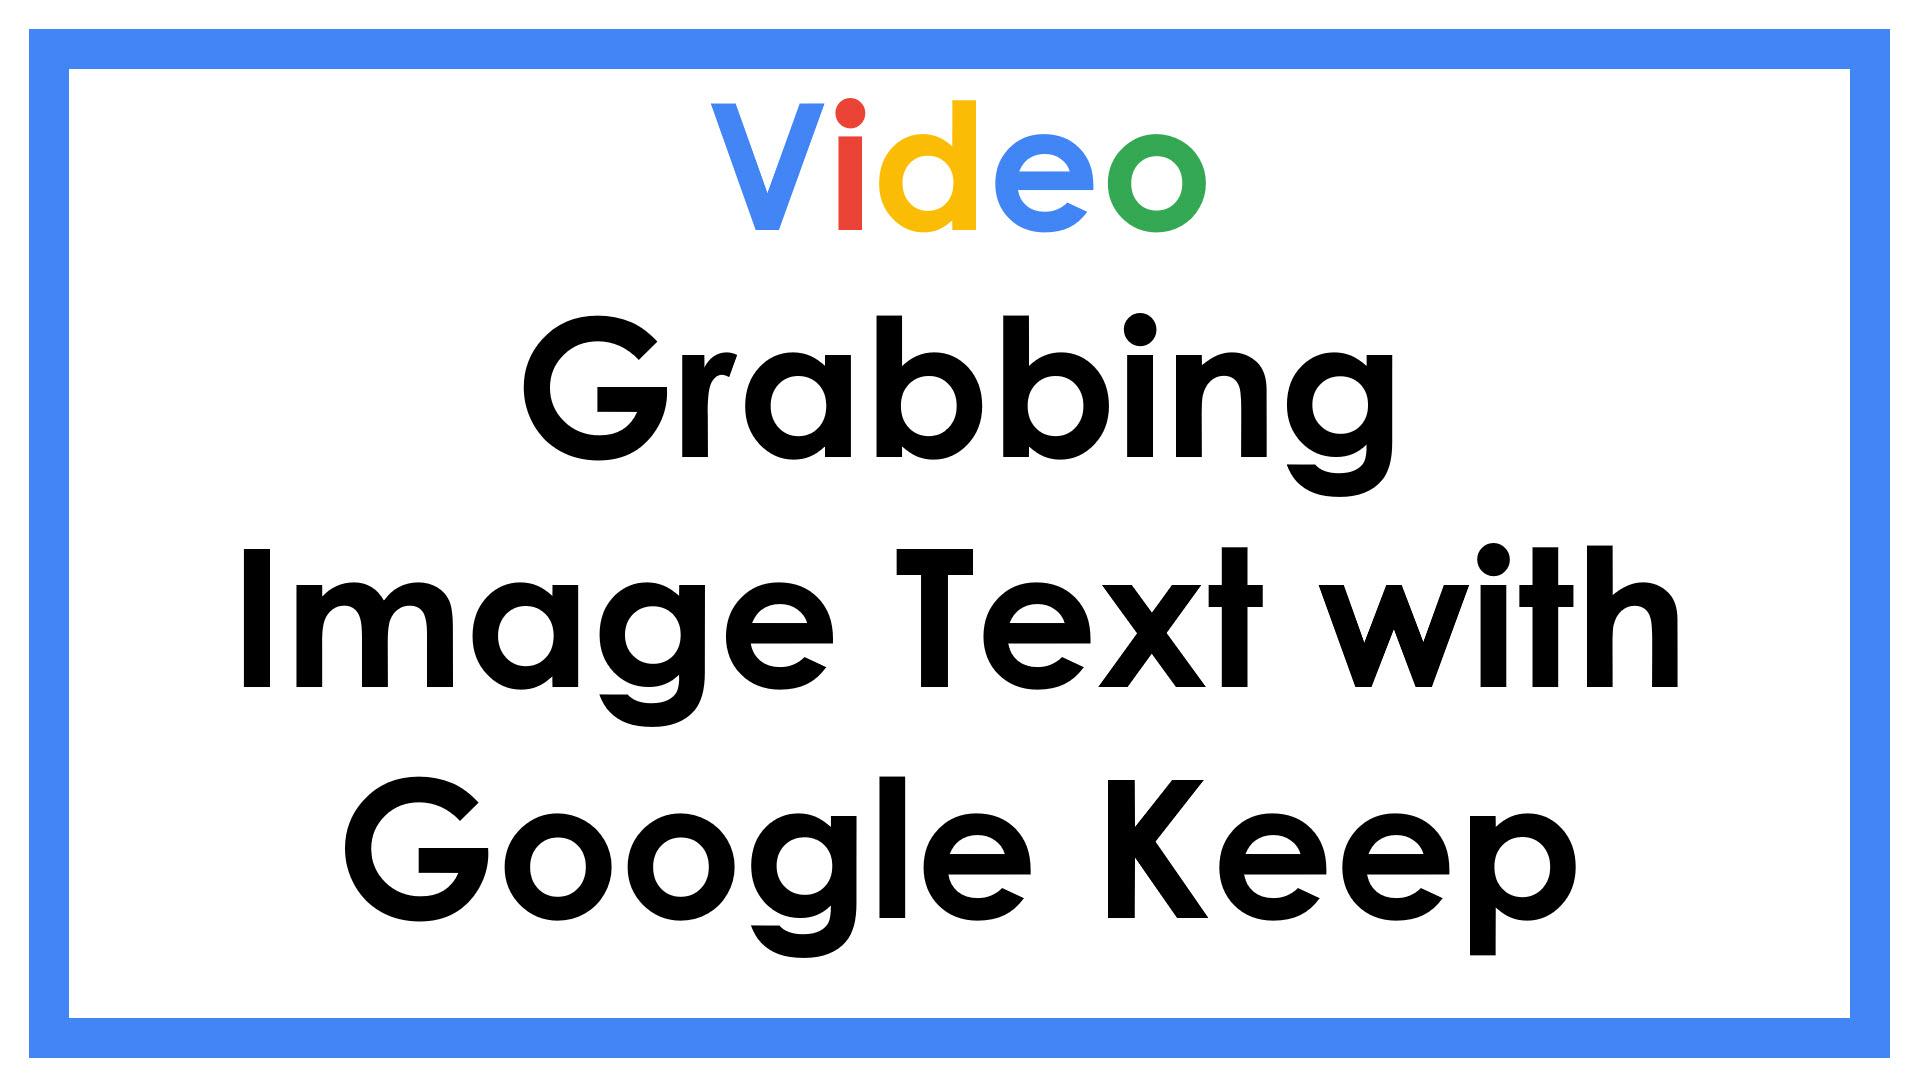 Grabbing Image Text with Google Keep